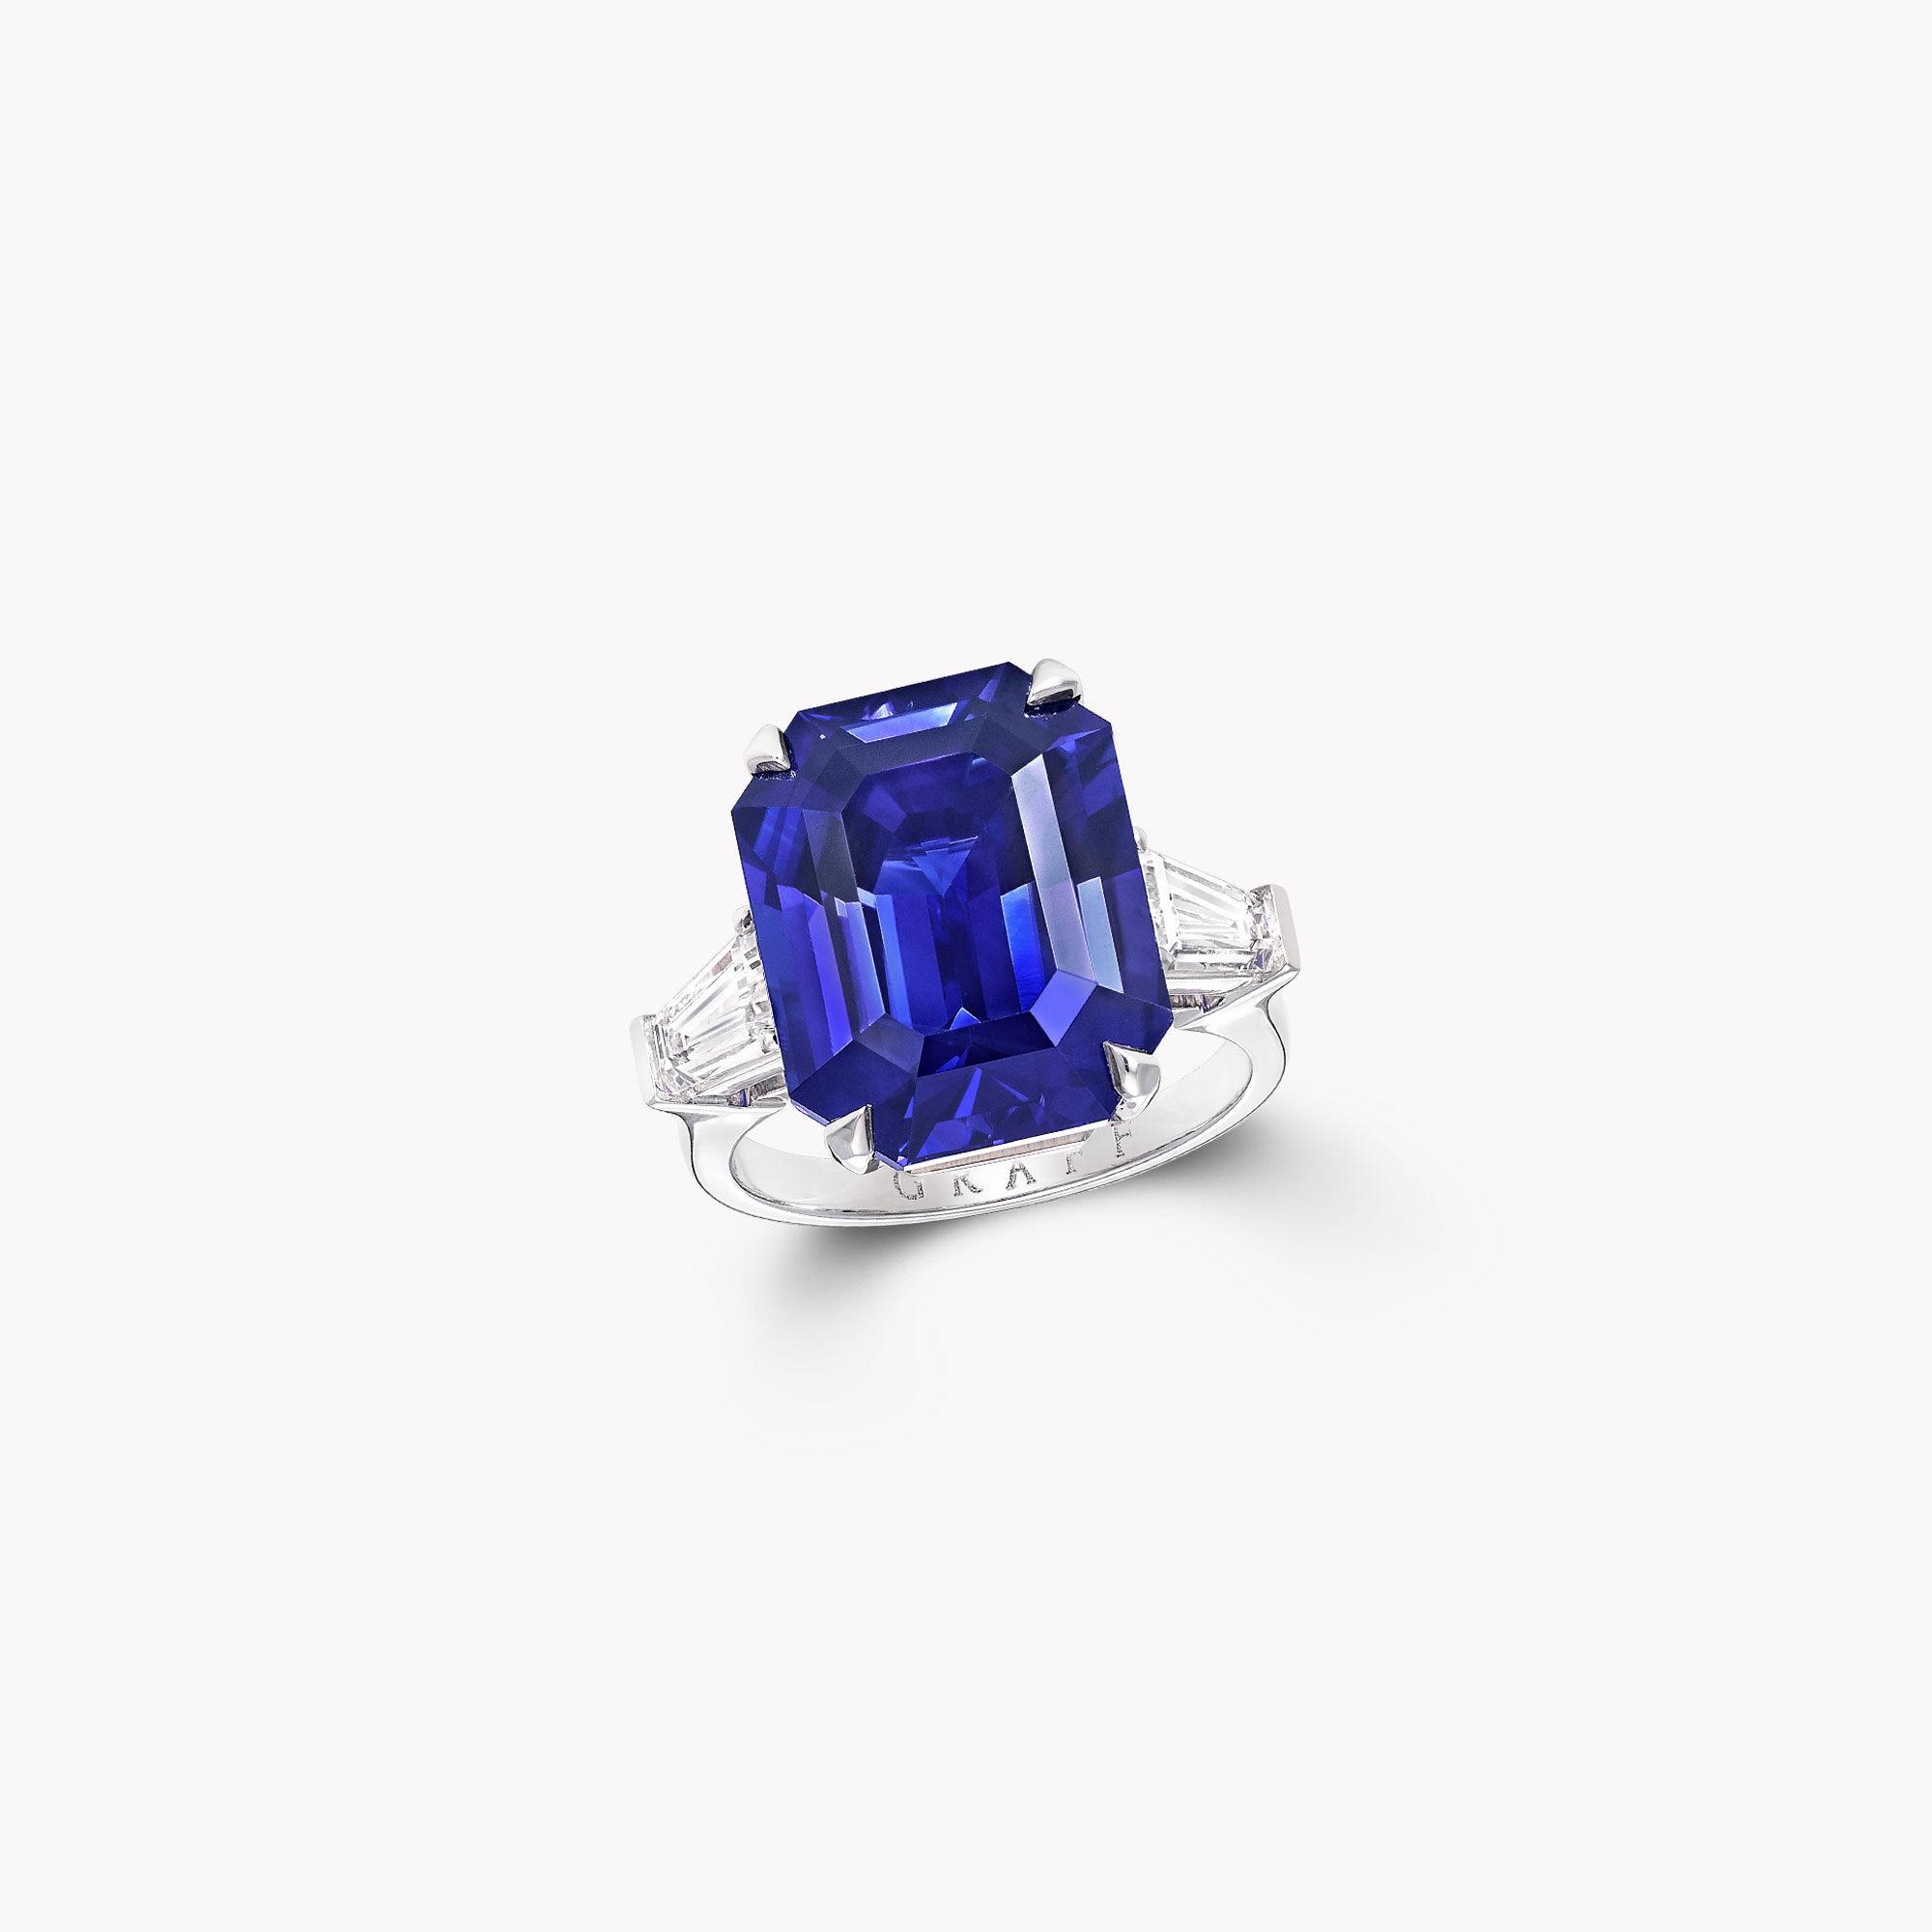 A Graff emerald cut sapphire and white diamond high jewellery ring